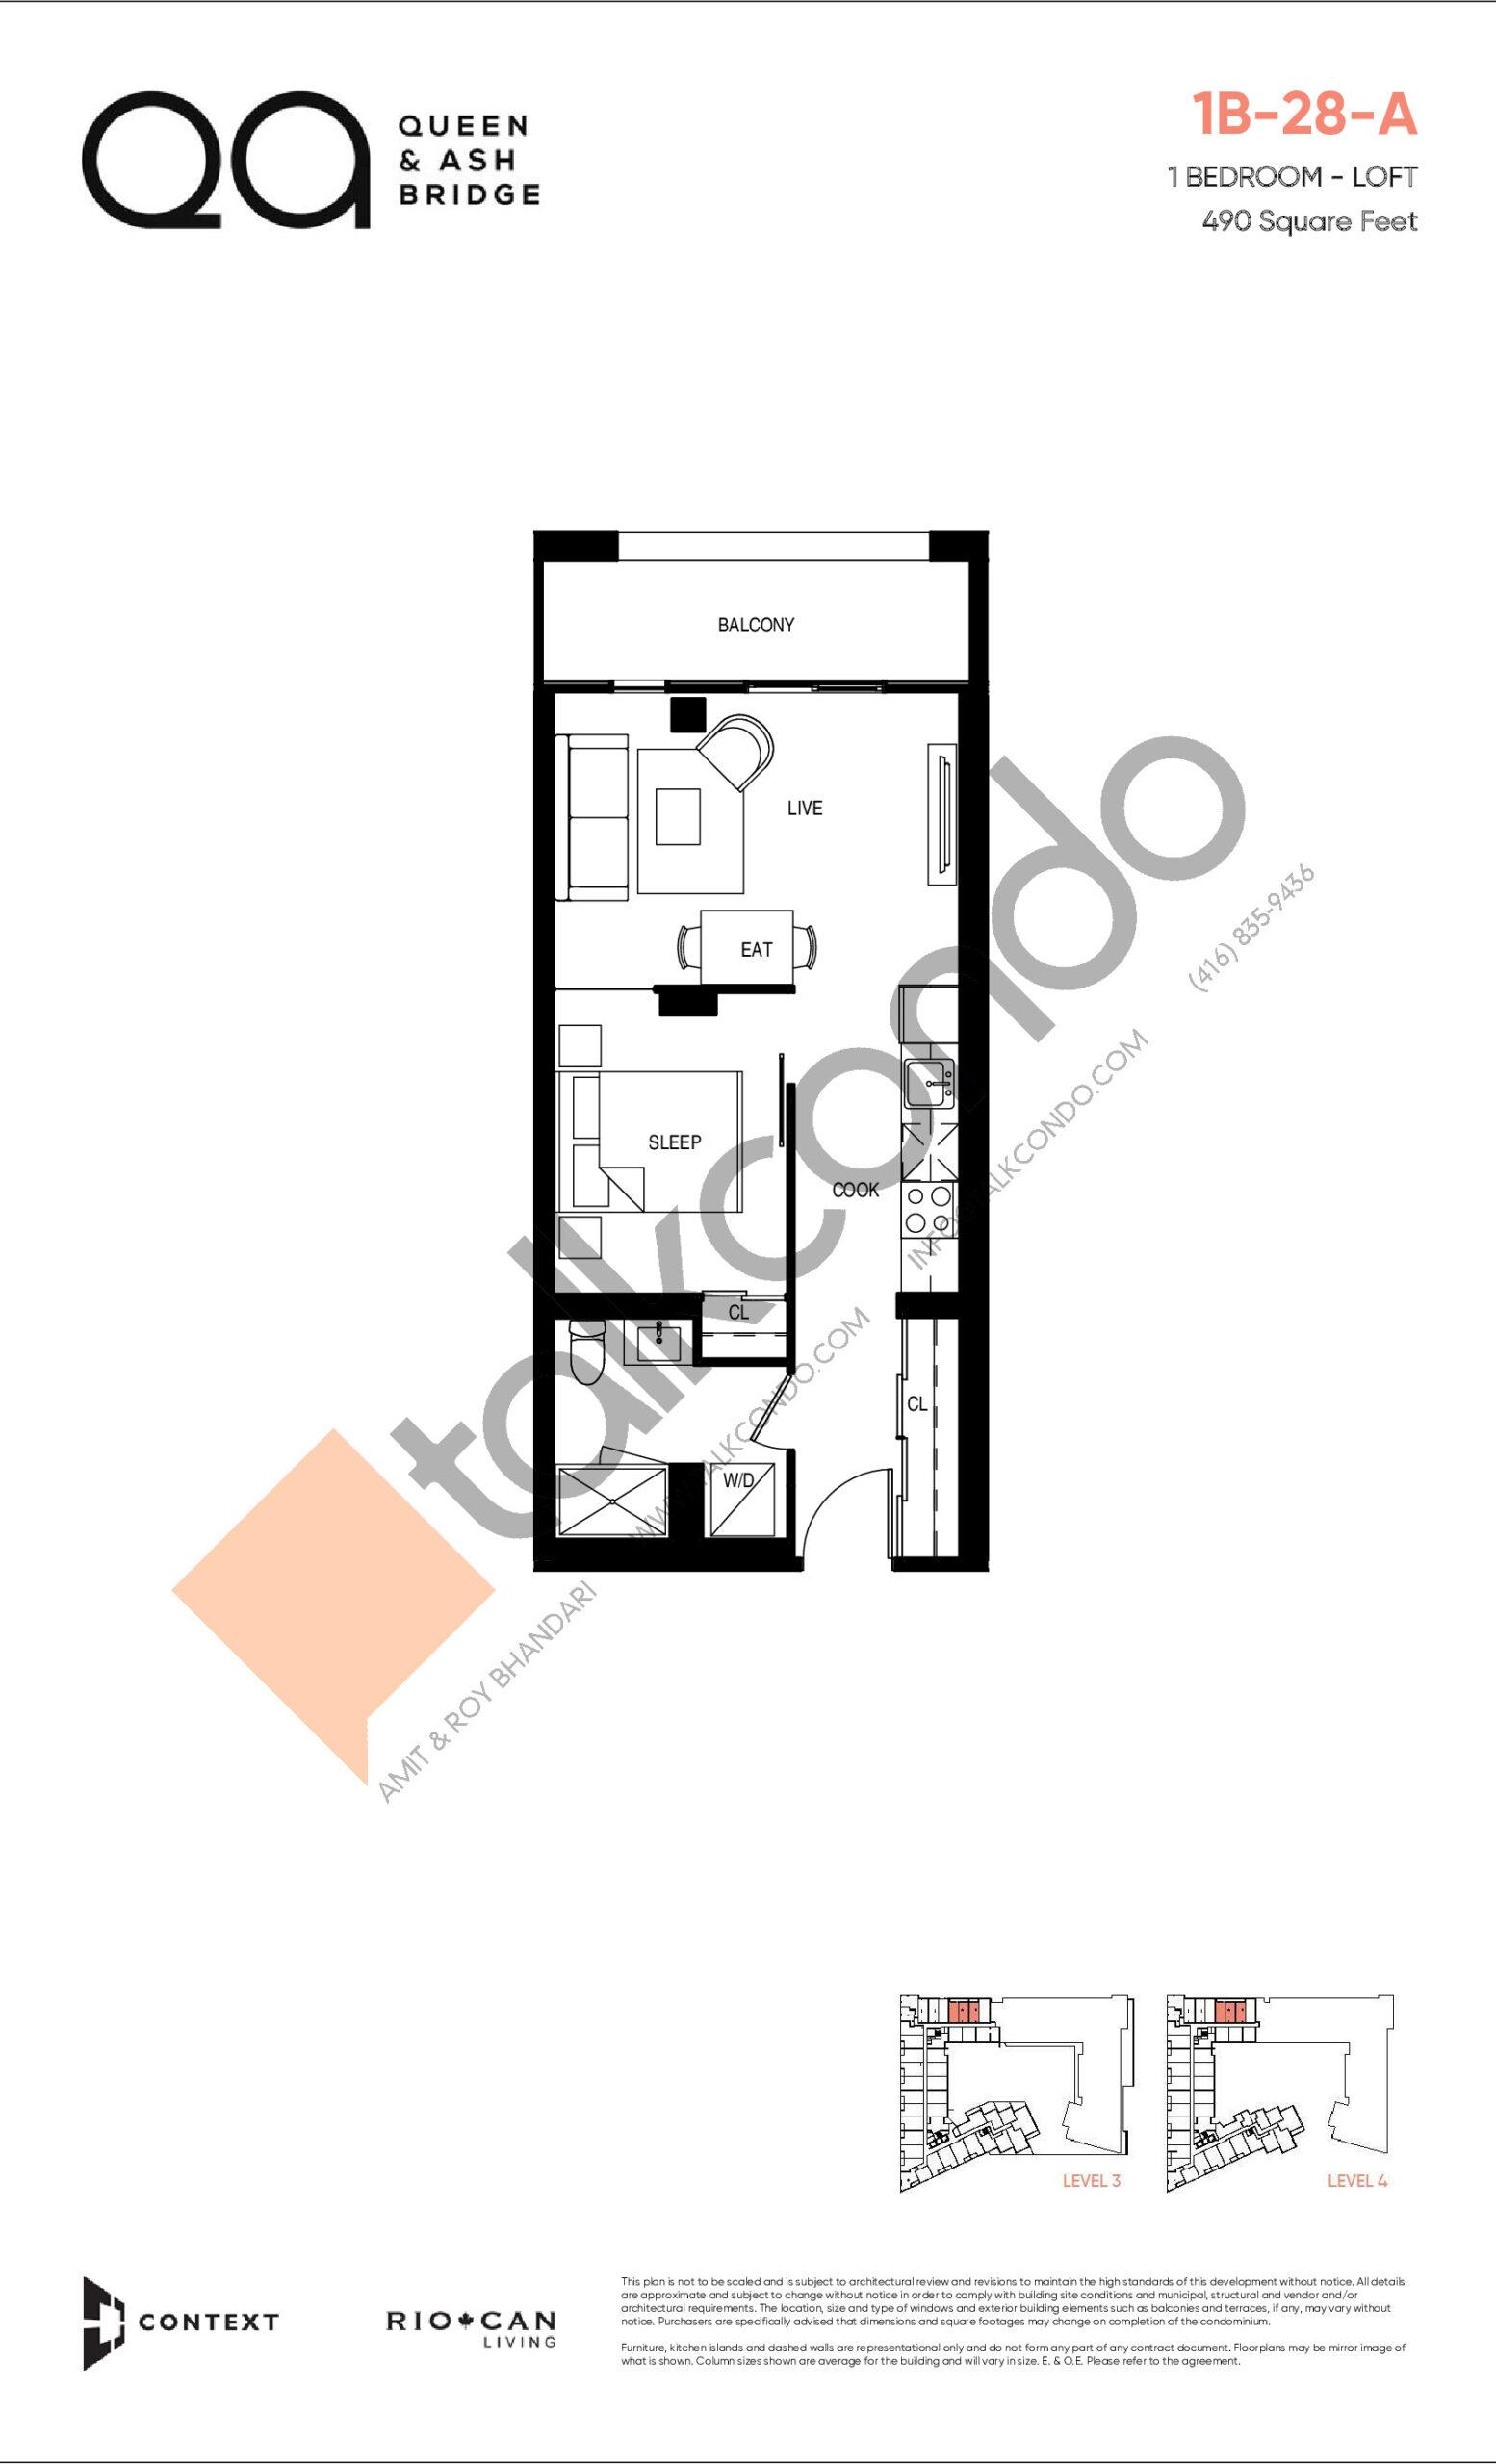 1B-28-A (Loft Collection) Floor Plan at QA Condos - 490 sq.ft